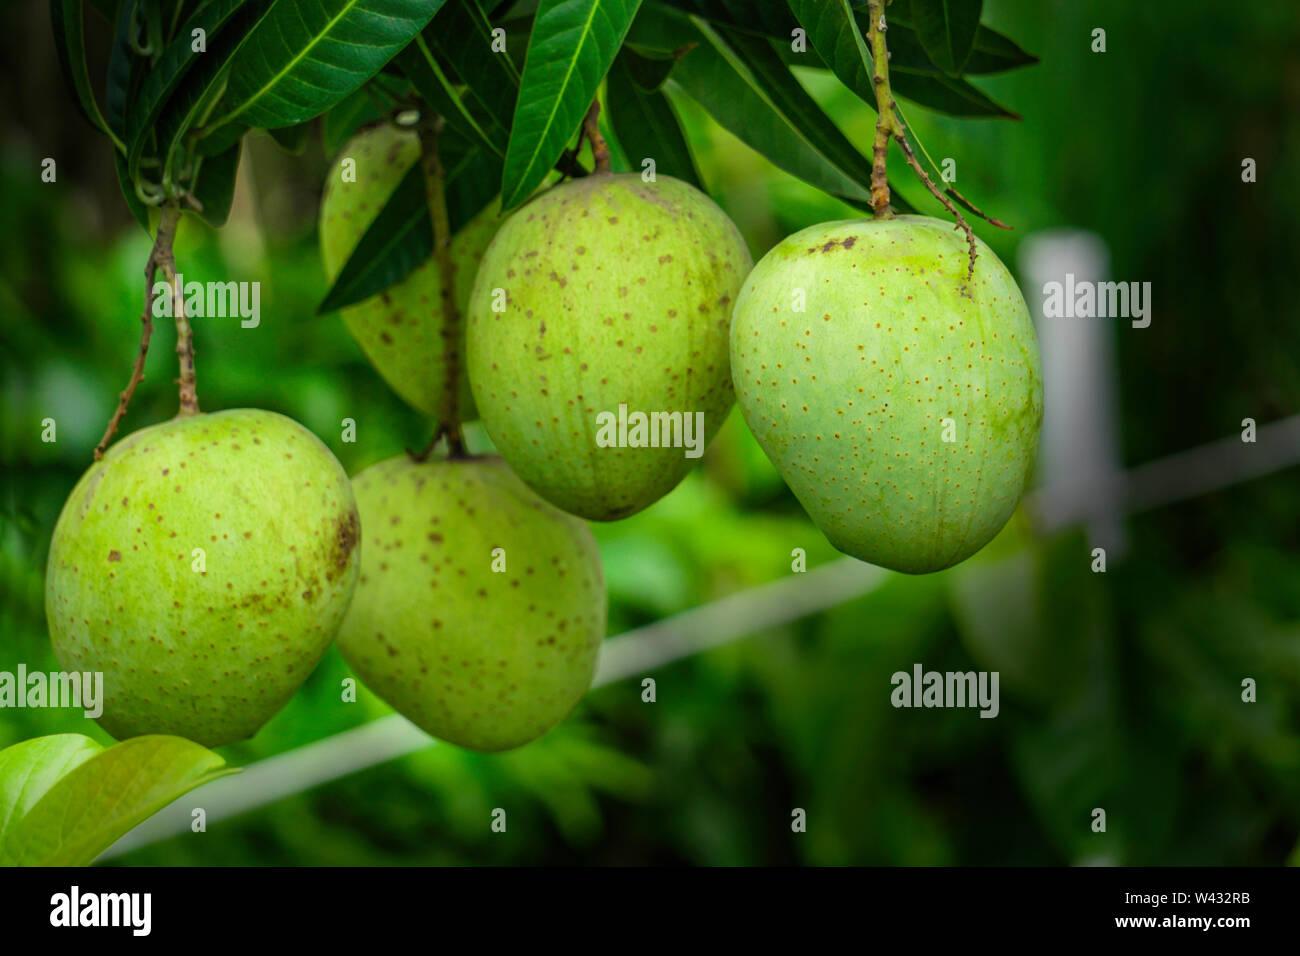 Green & Yellow King Size Bangladesh Himsagar mango Growth Kashmir Mango. Tree with mango fruits hanging from branches in a garden. Selective focus. - Stock Image